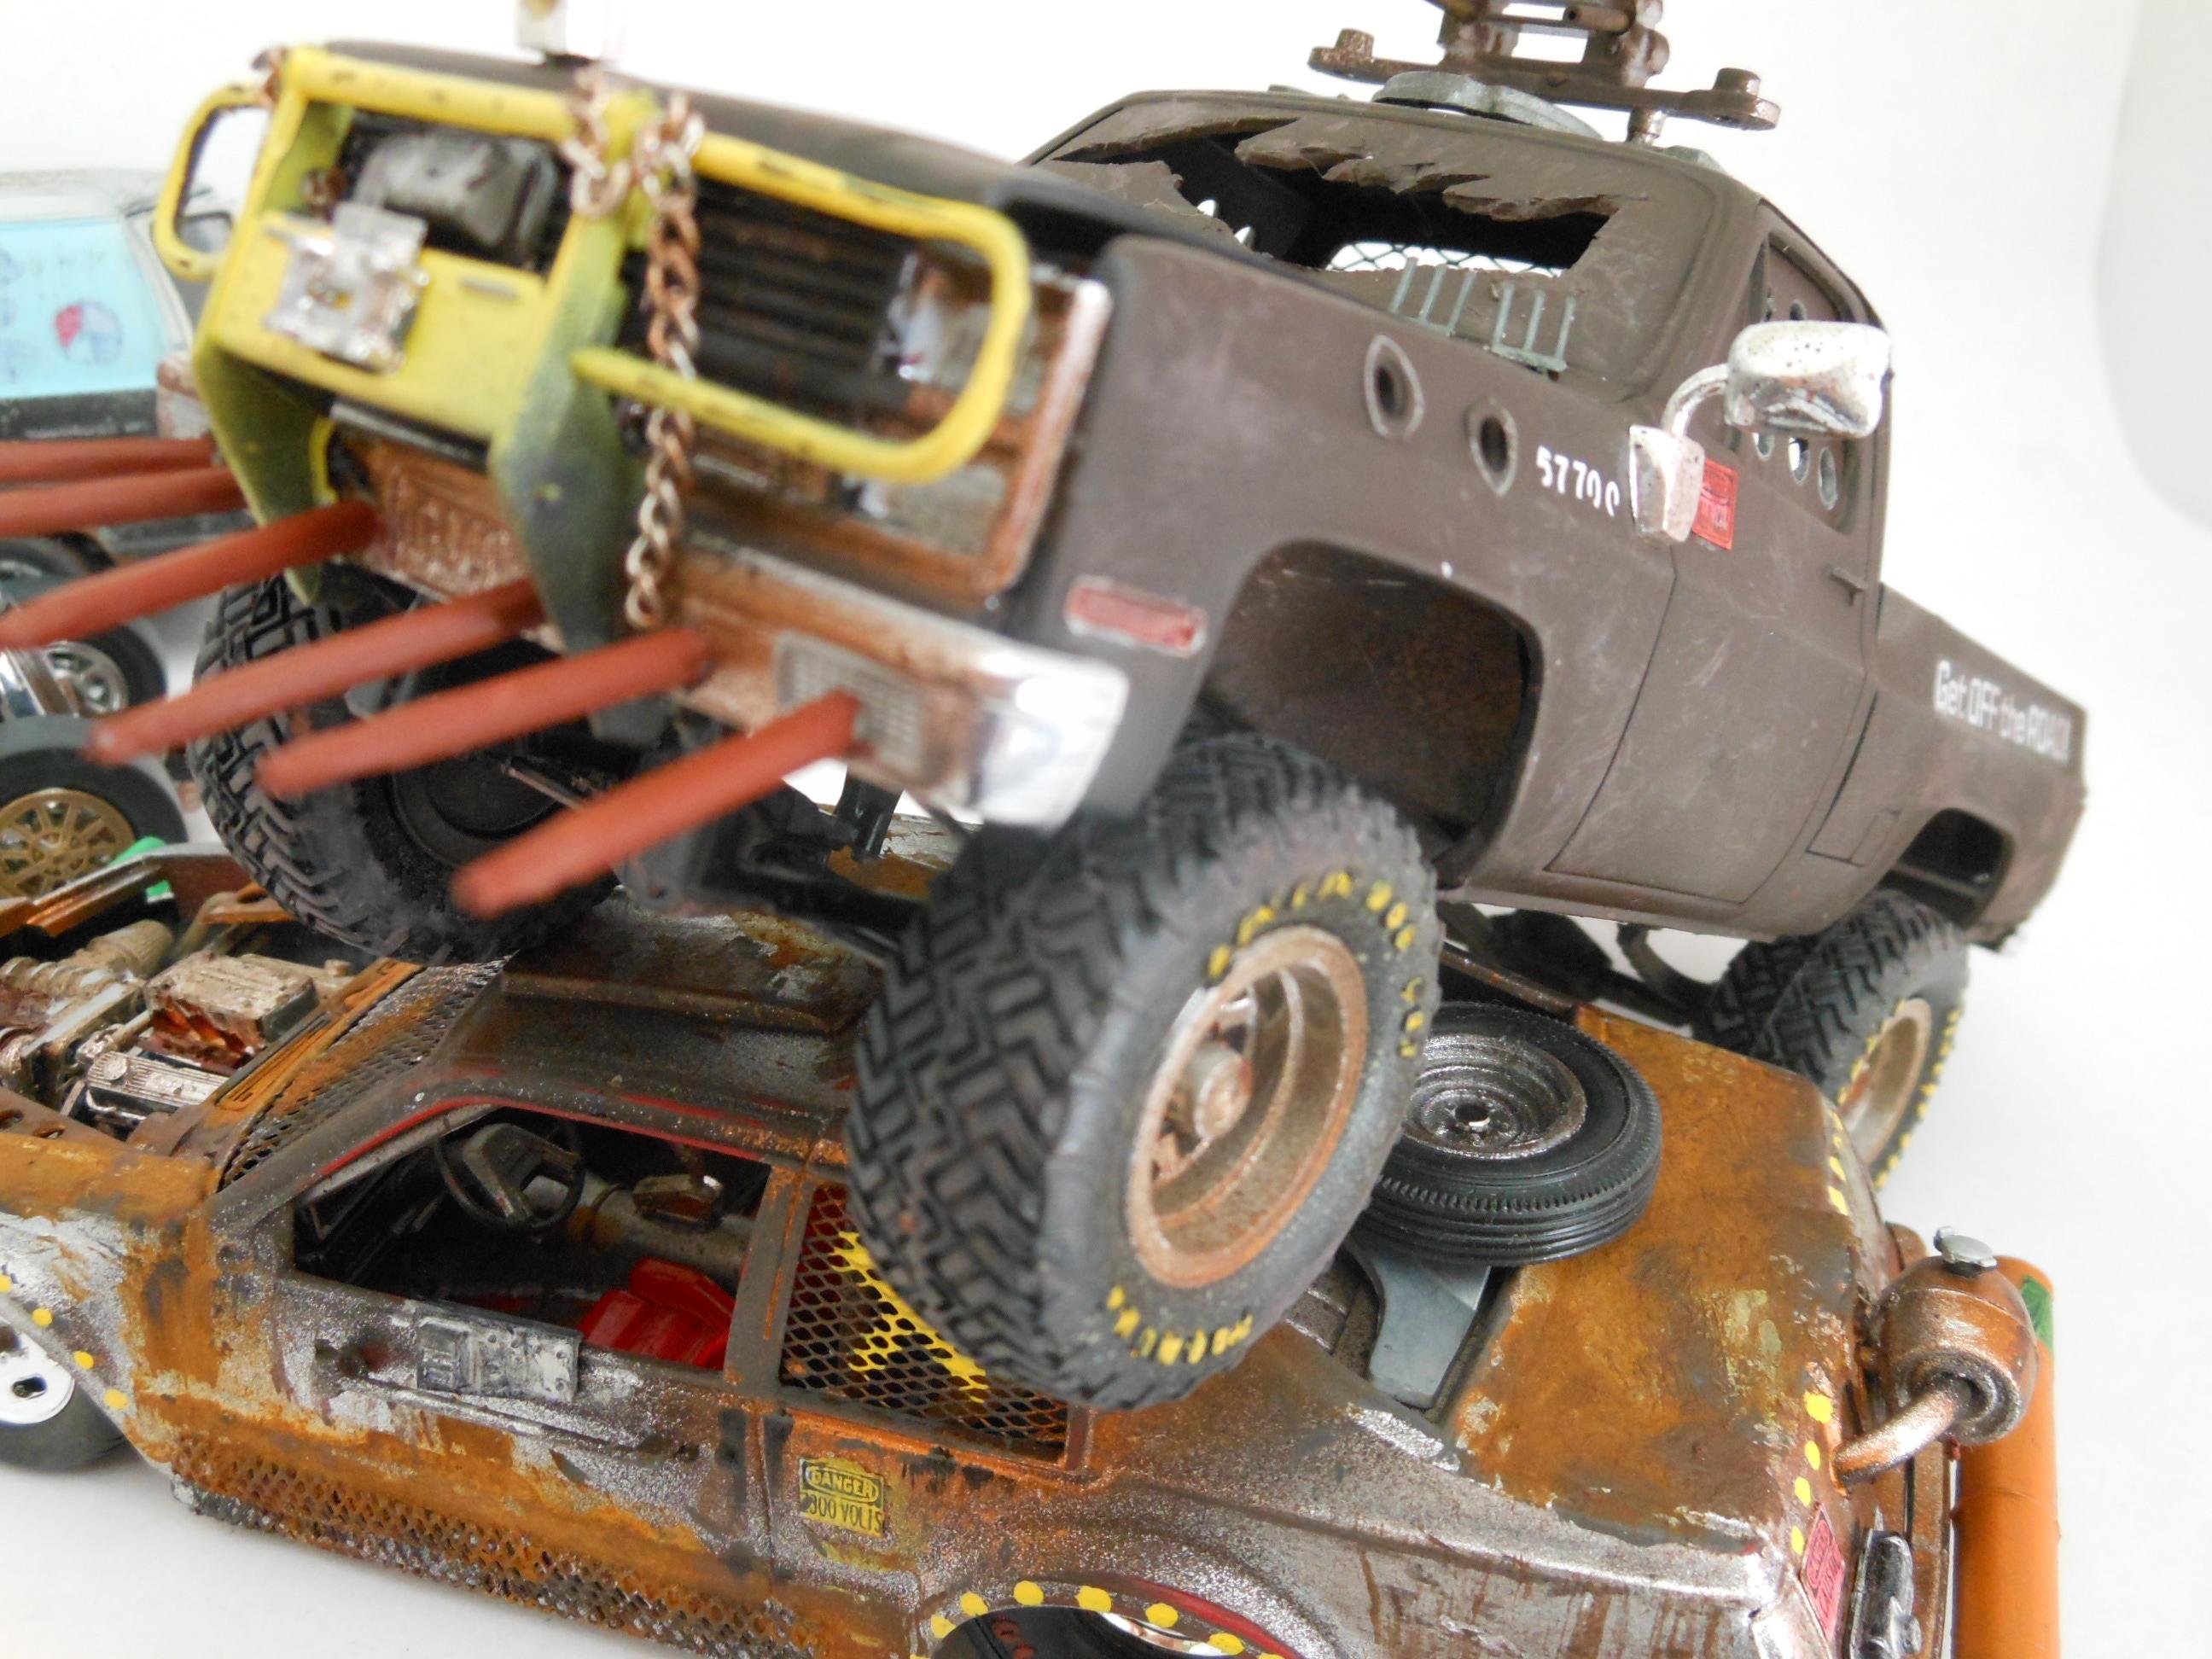 Icm_fullxfull 97985418_kt8nmqqec5wsokockwgs jpg 2 592 1 944 pixels zombie apocalypse vehicles pinterest